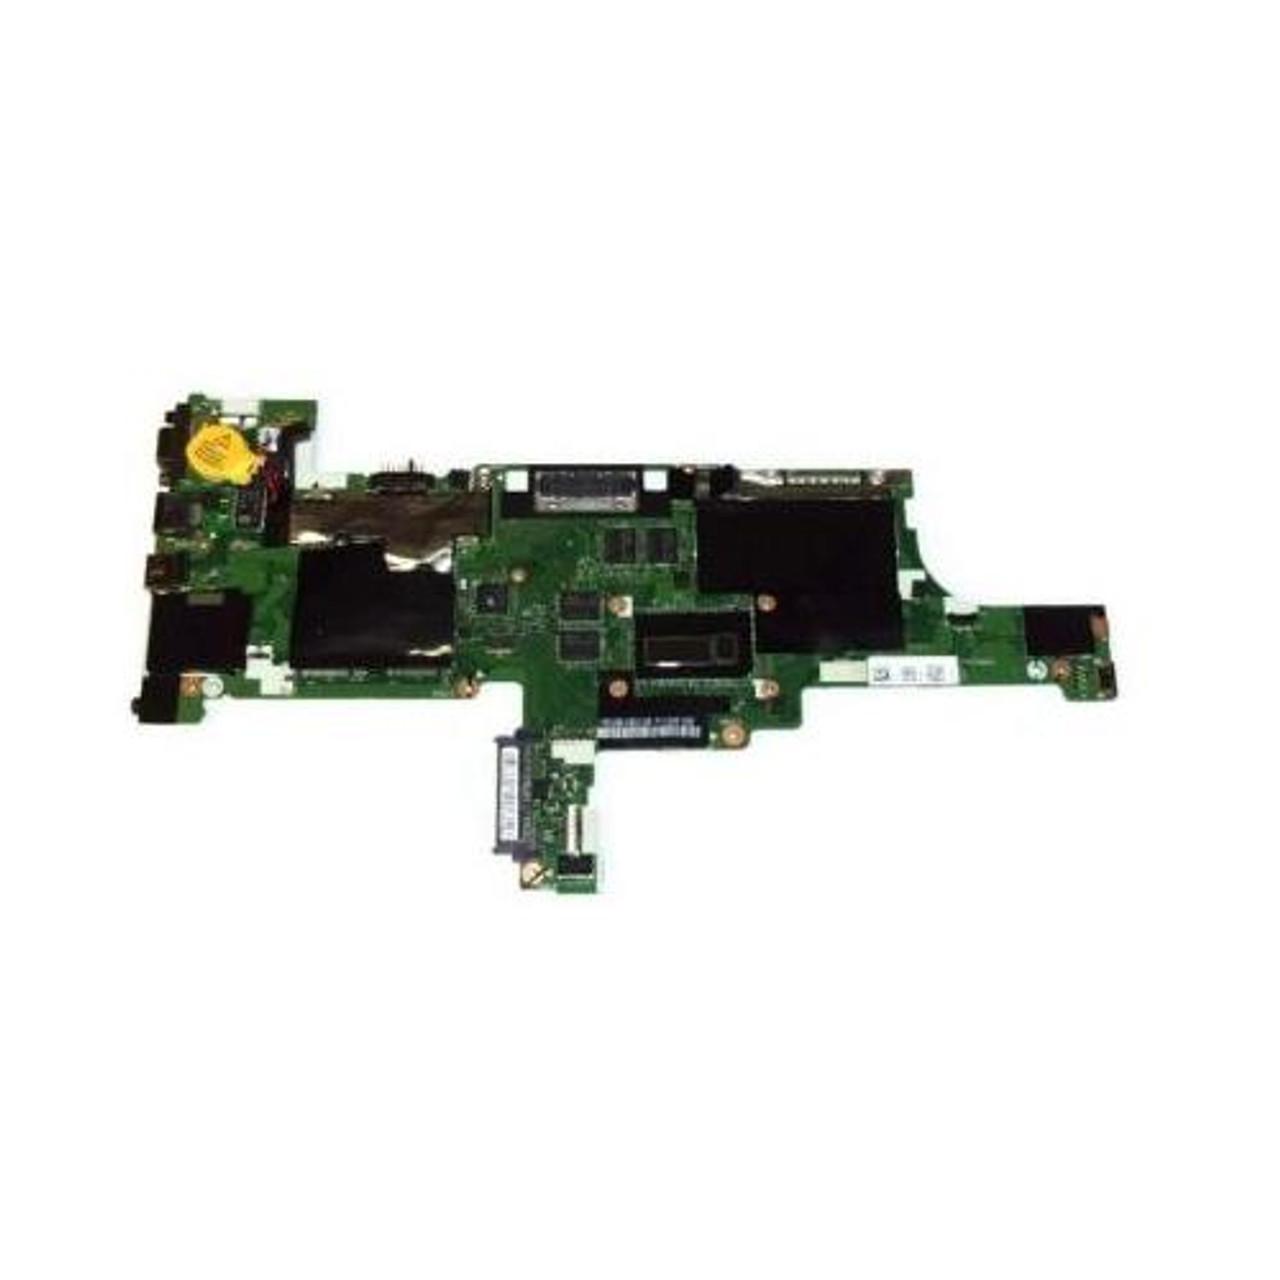 00HM157 Lenovo ThinkPad T440 i5-4200U 1.6GHz Laptop Motherboard